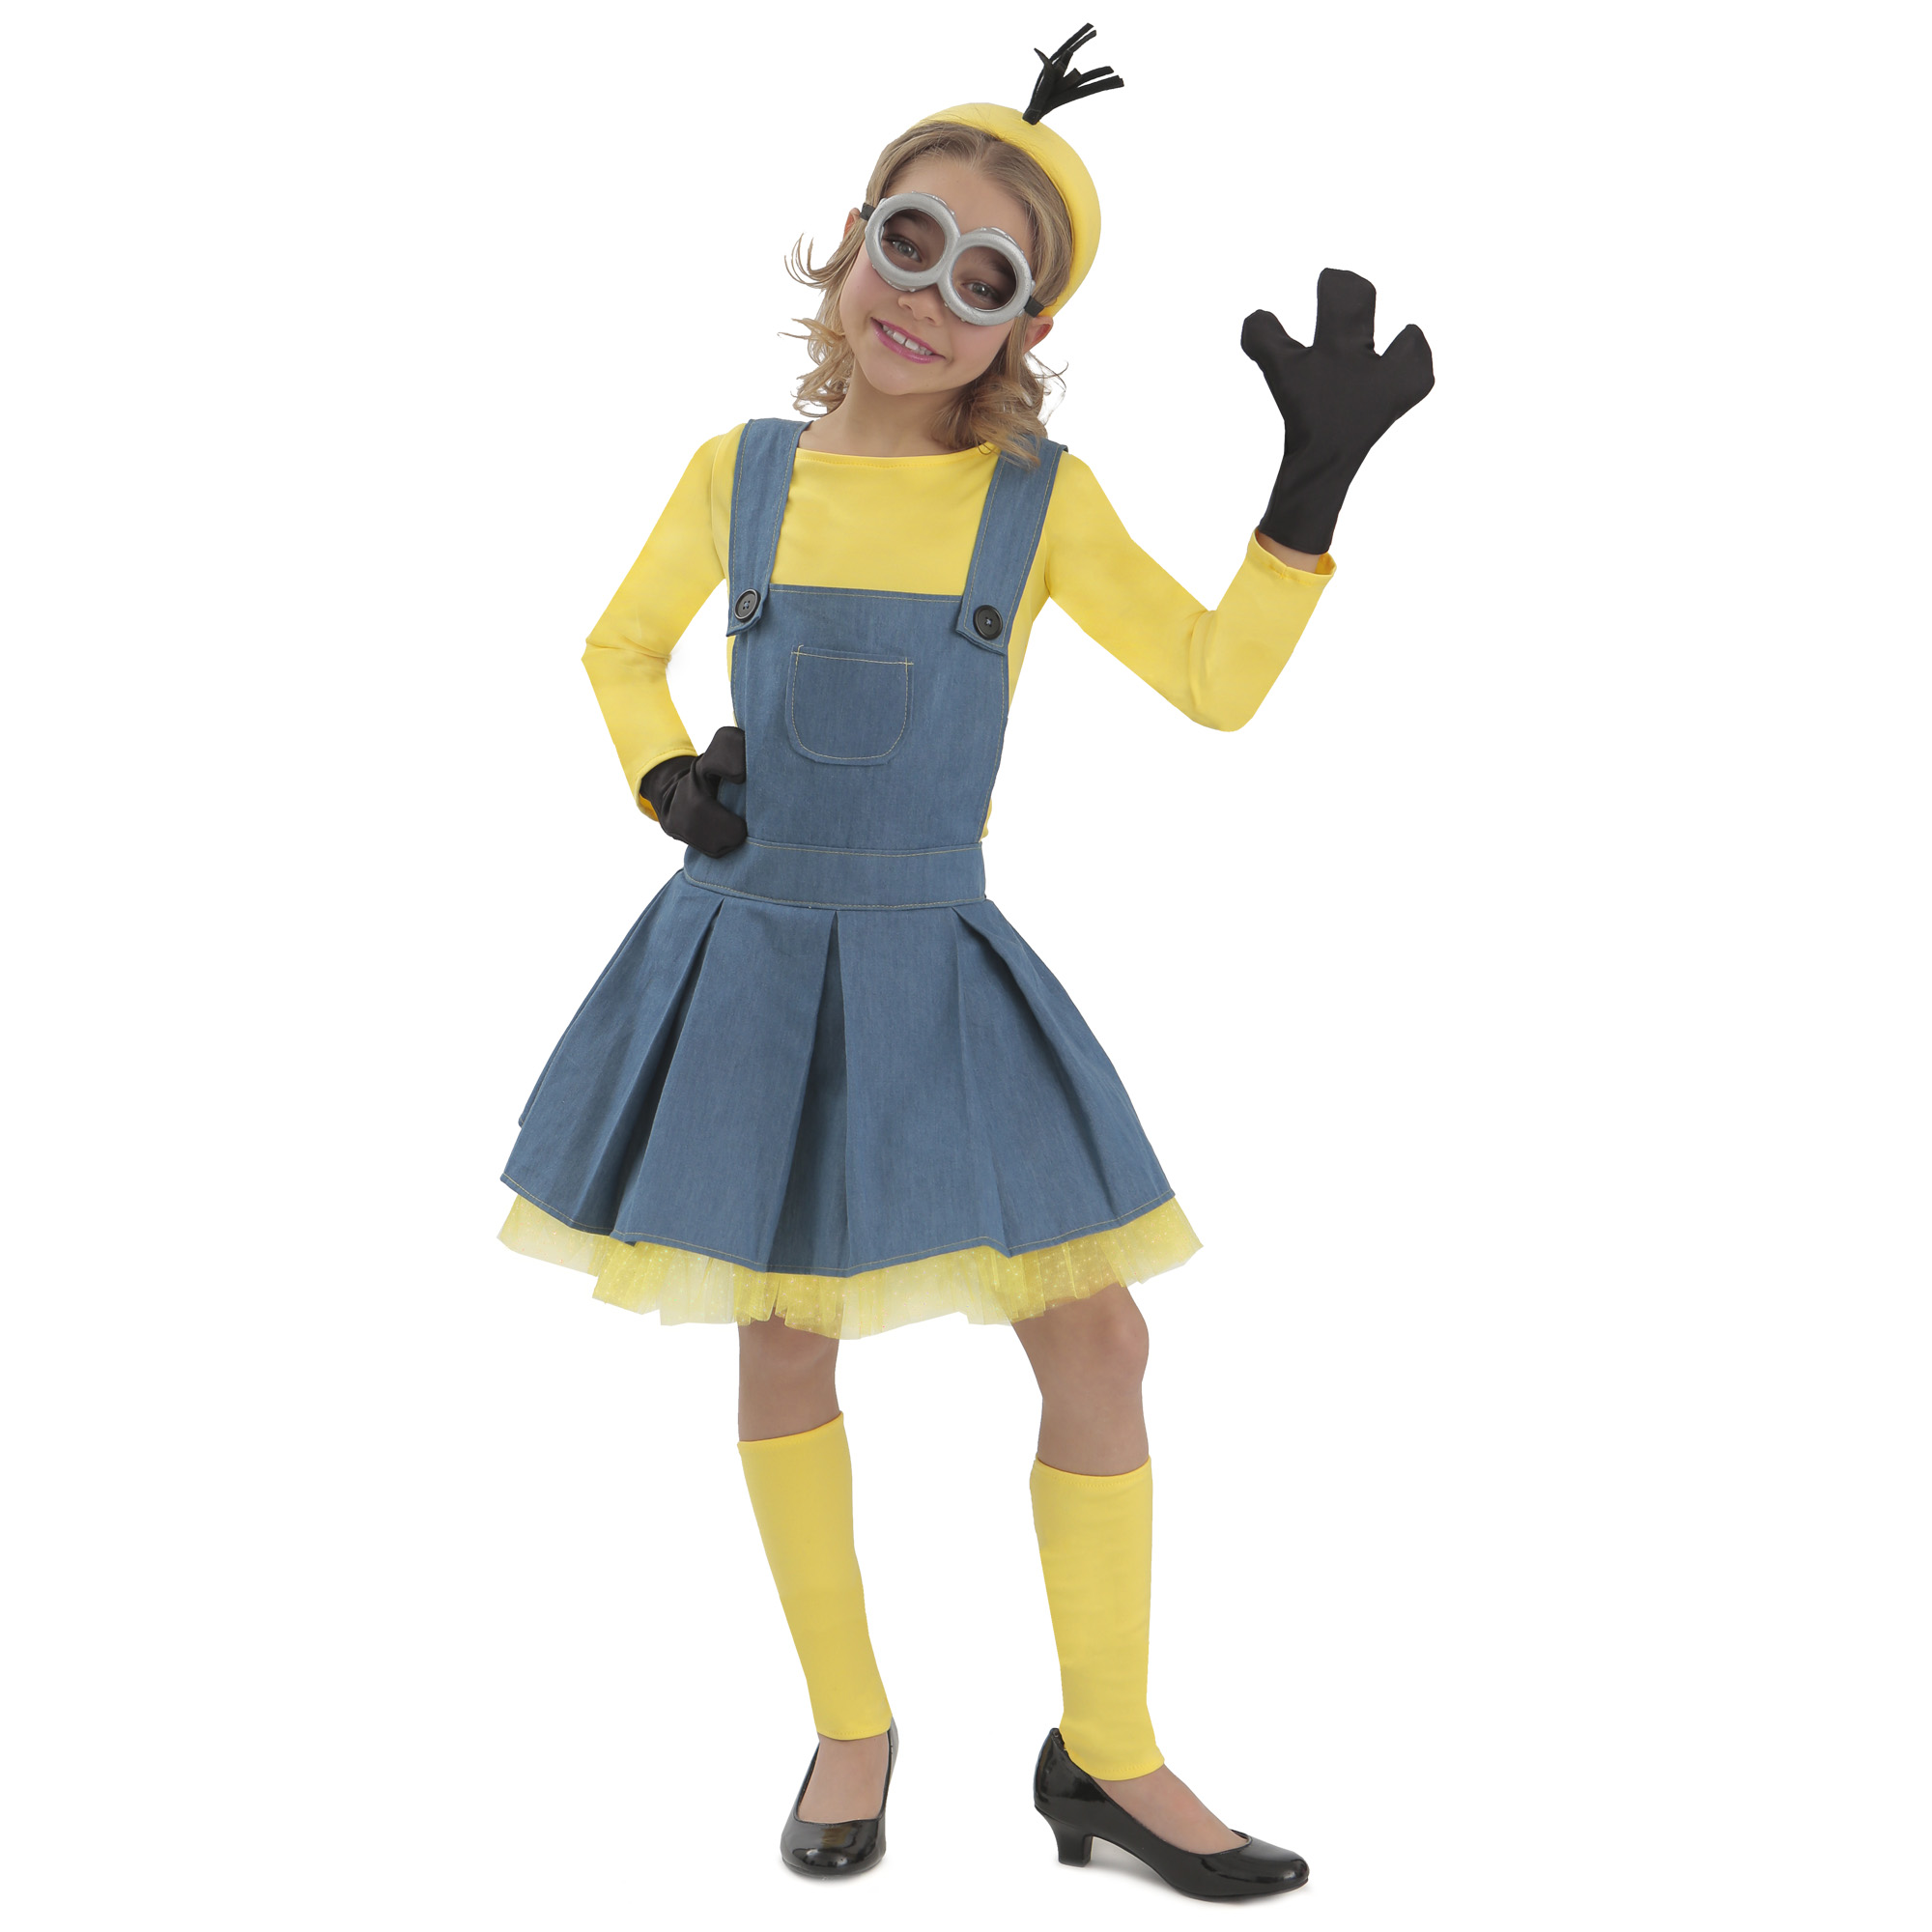 Minions Girl Jumper Halloween Costume by Princess Paradise